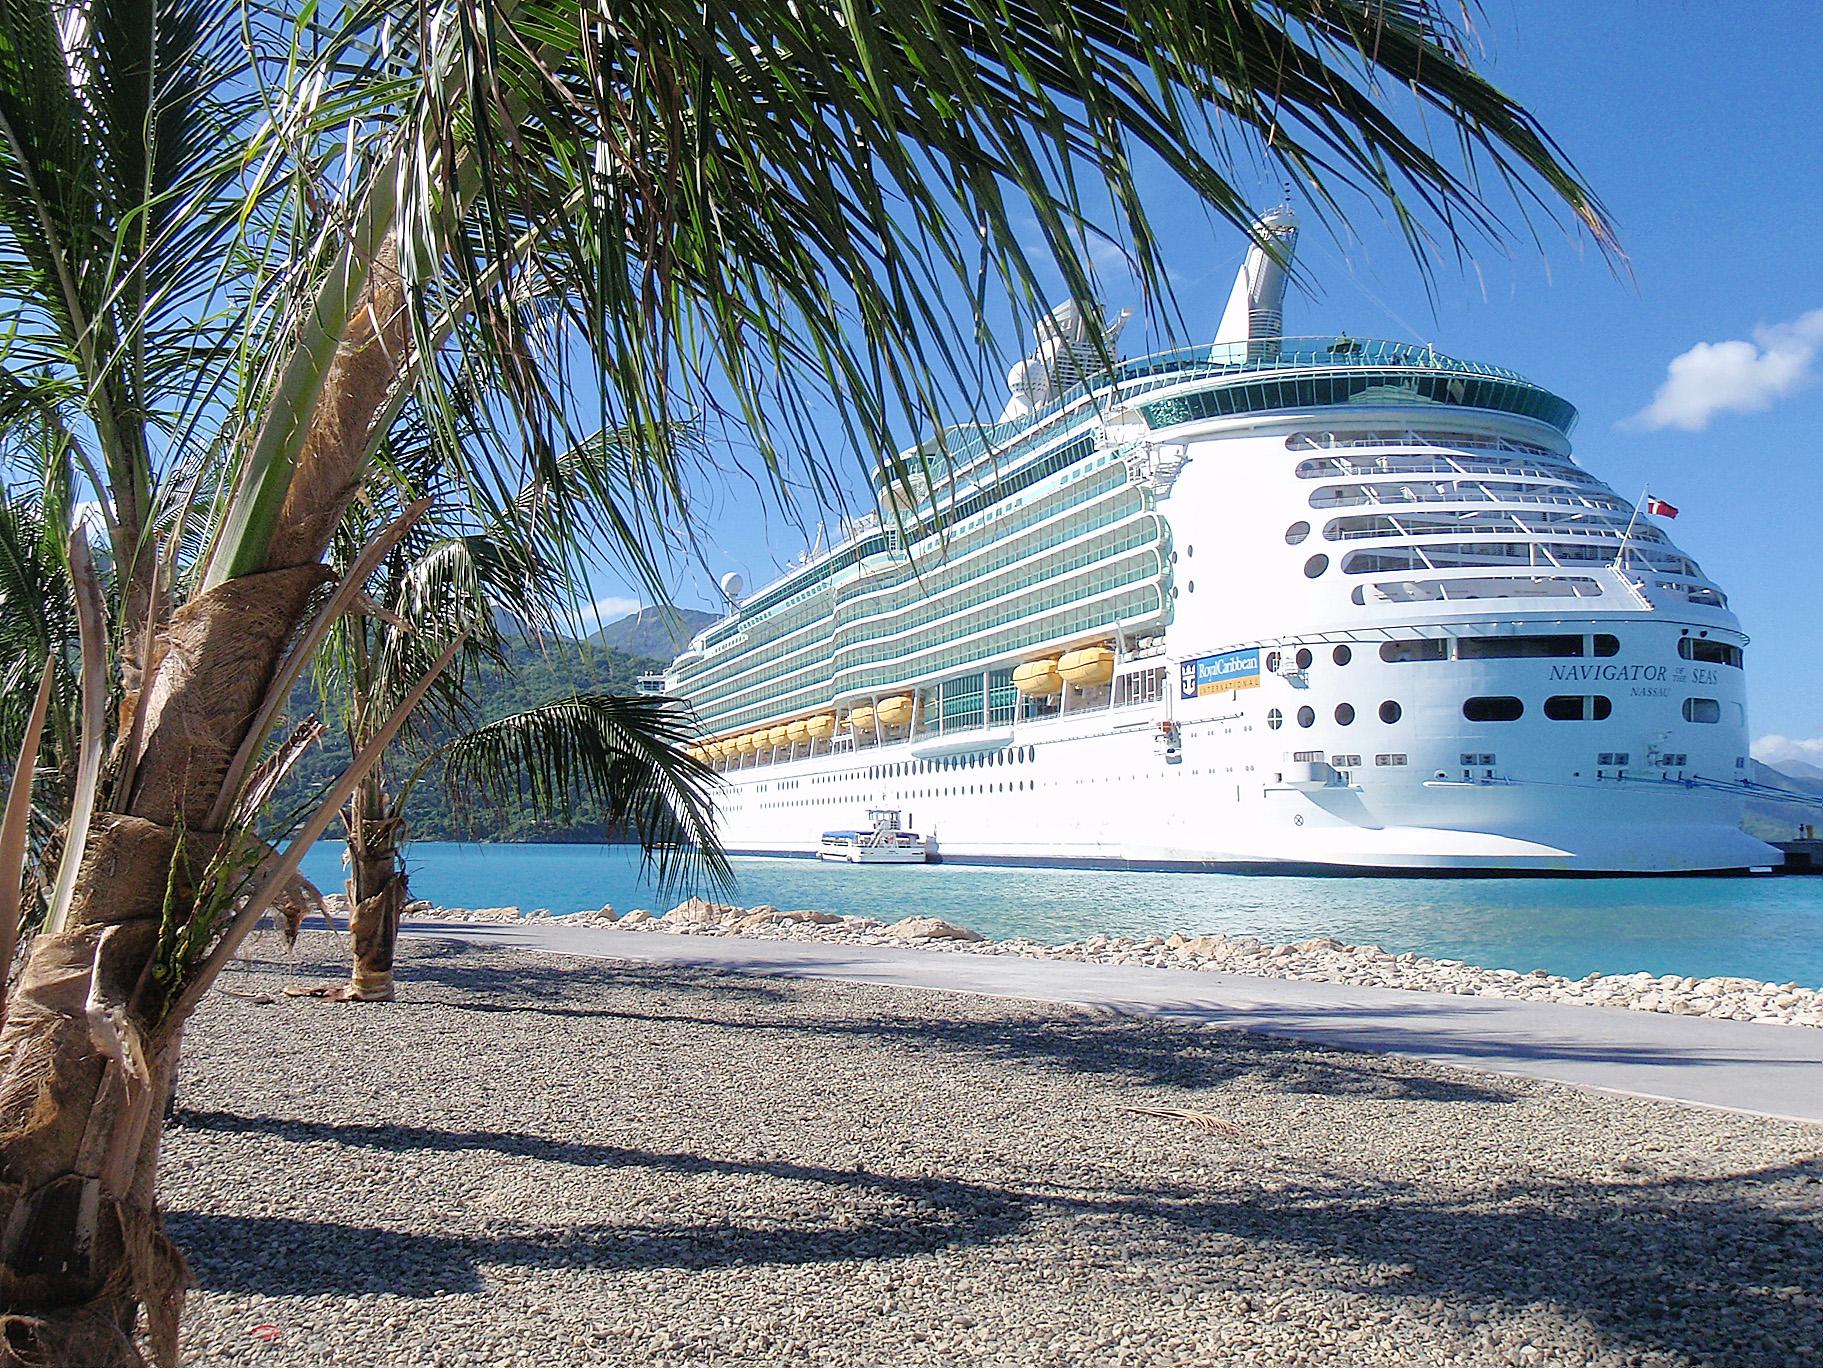 NOS docked at Labadee